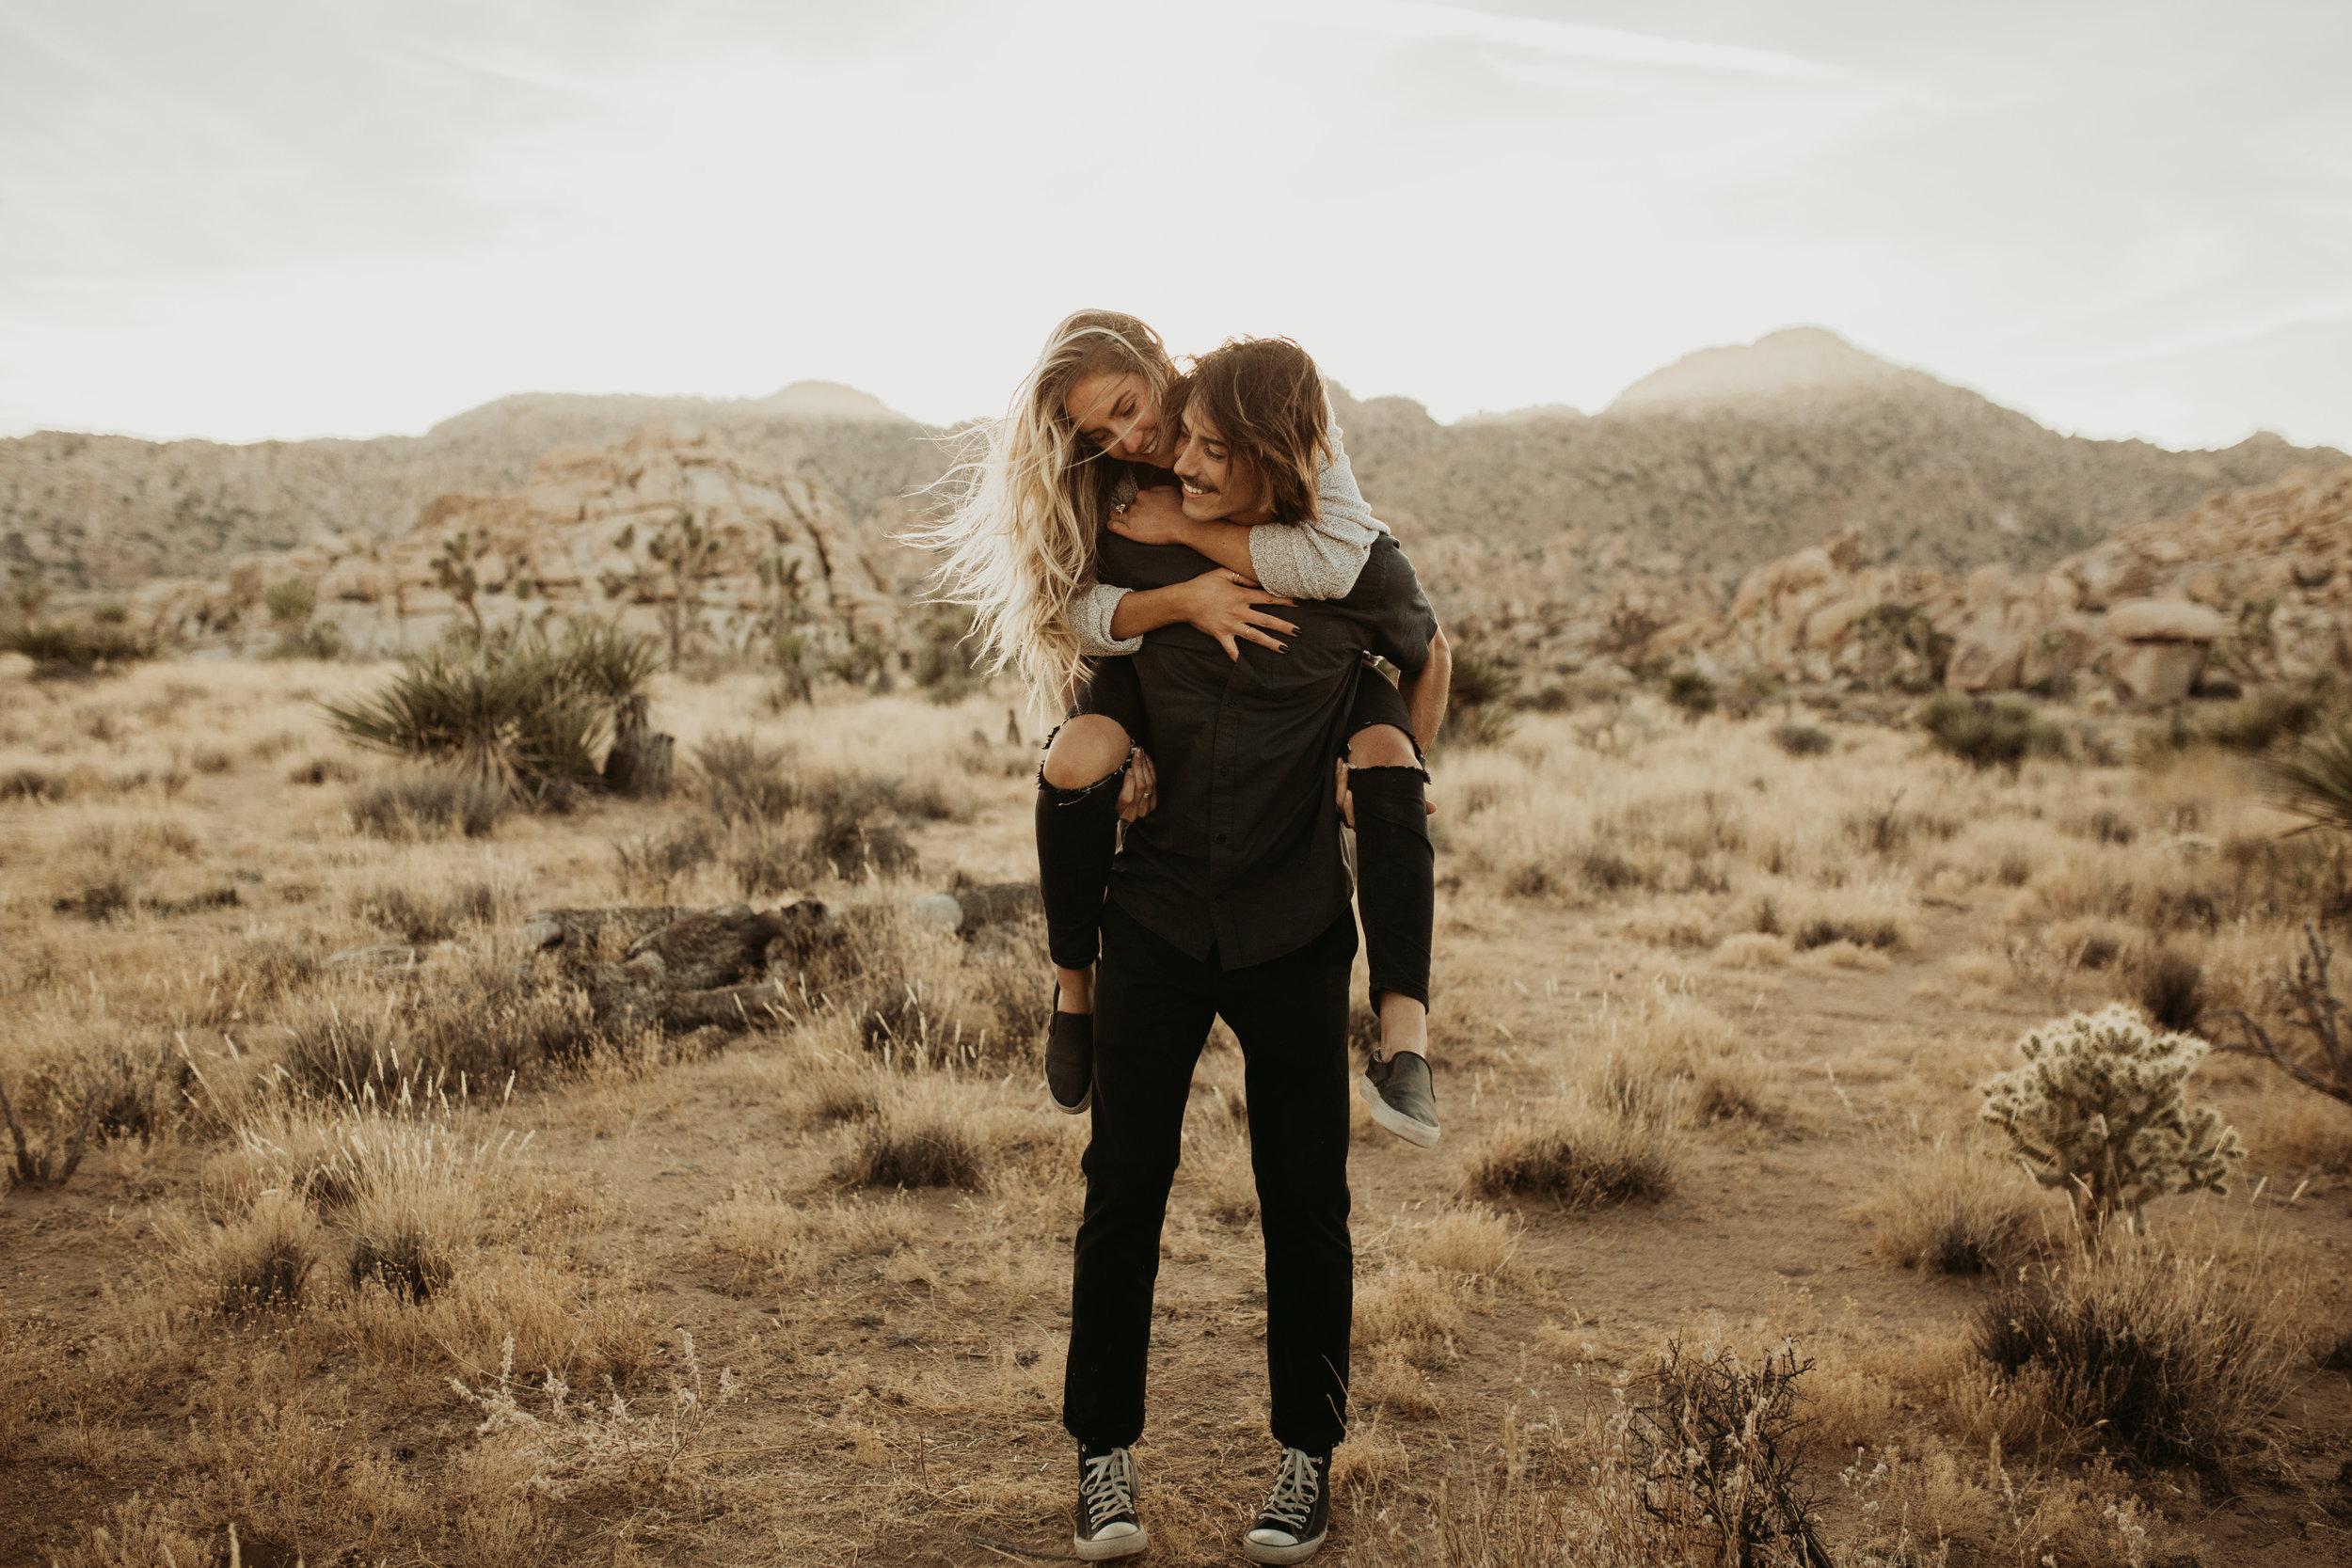 joshuatree+california+arizona+wedding+elopement+photographer14.jpg